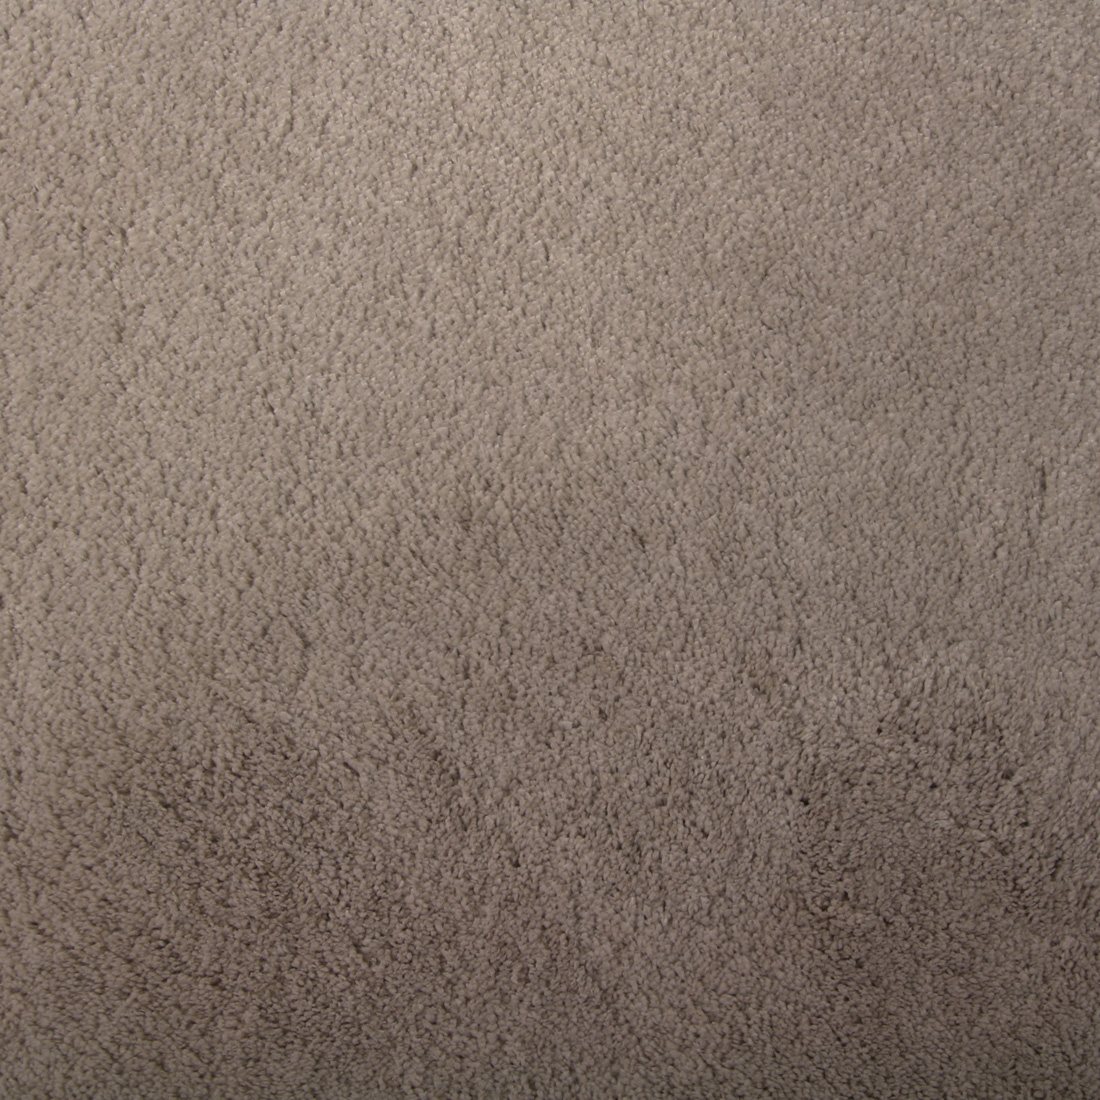 Vloerkleed Xilento Touch Classic Beige (extra zacht)